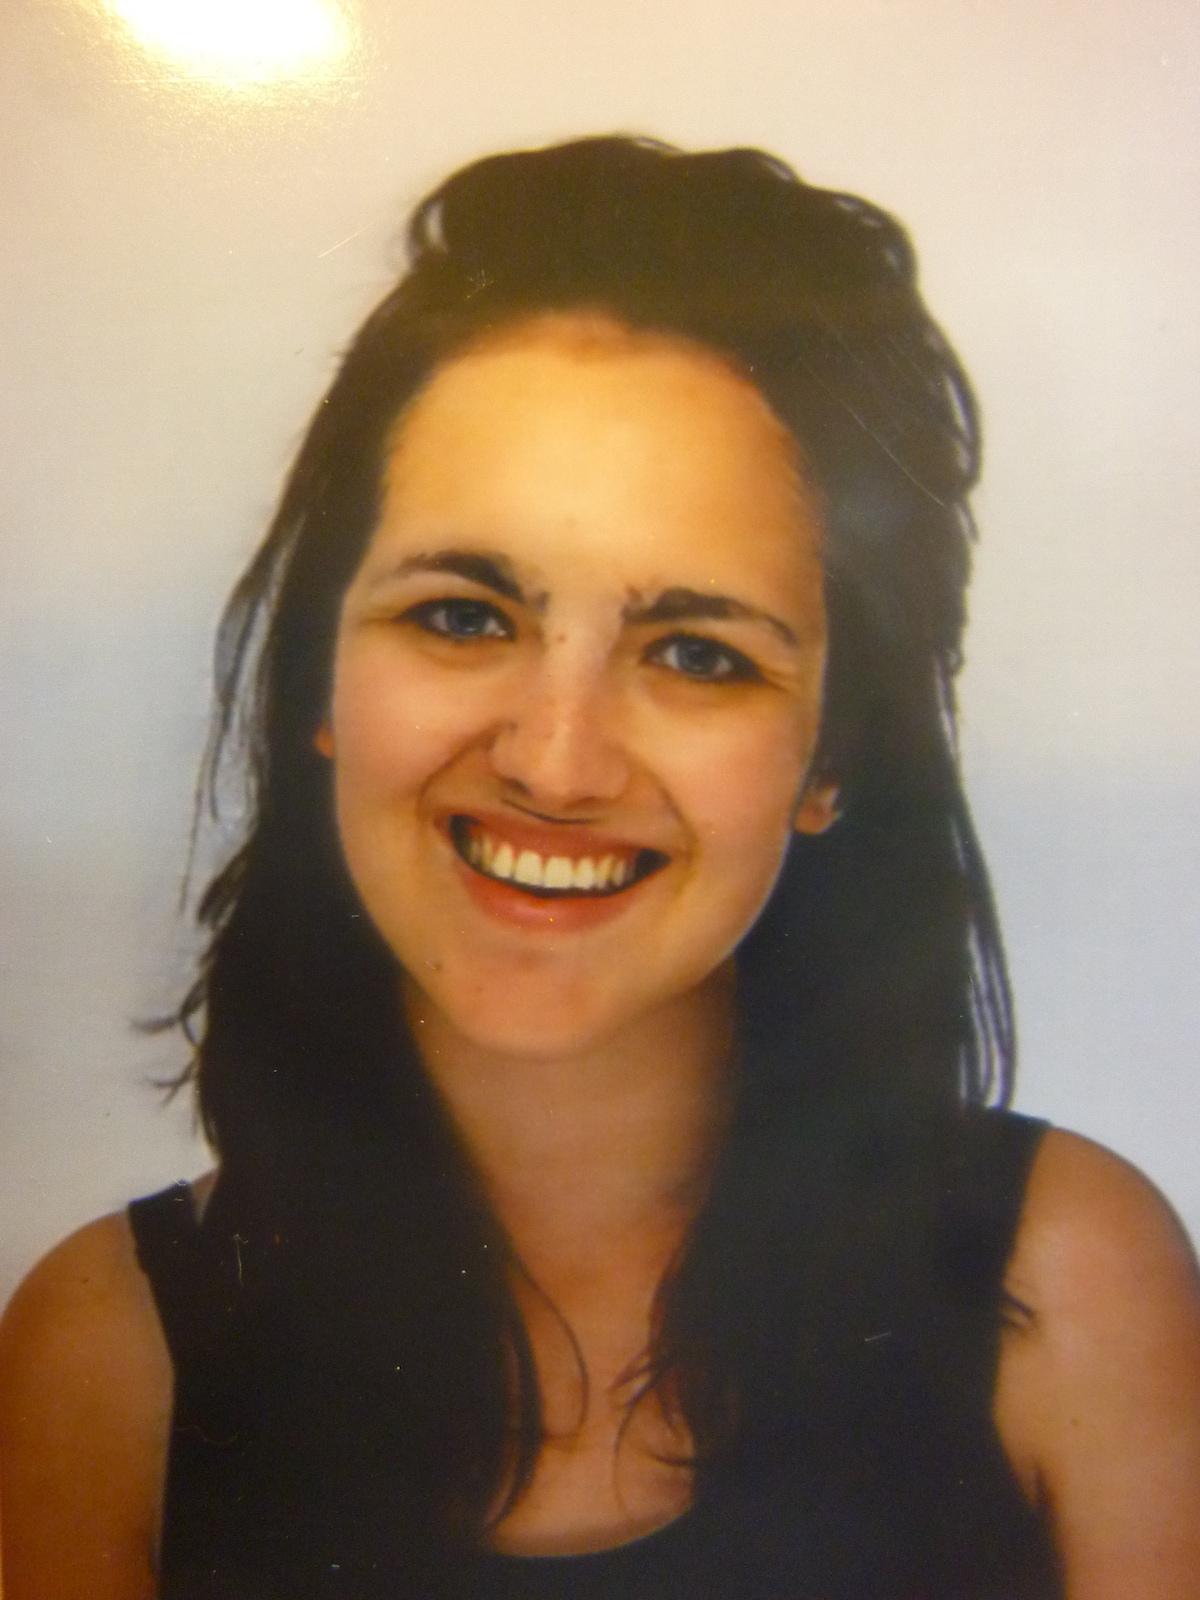 Charli From Innsbruck, Austria